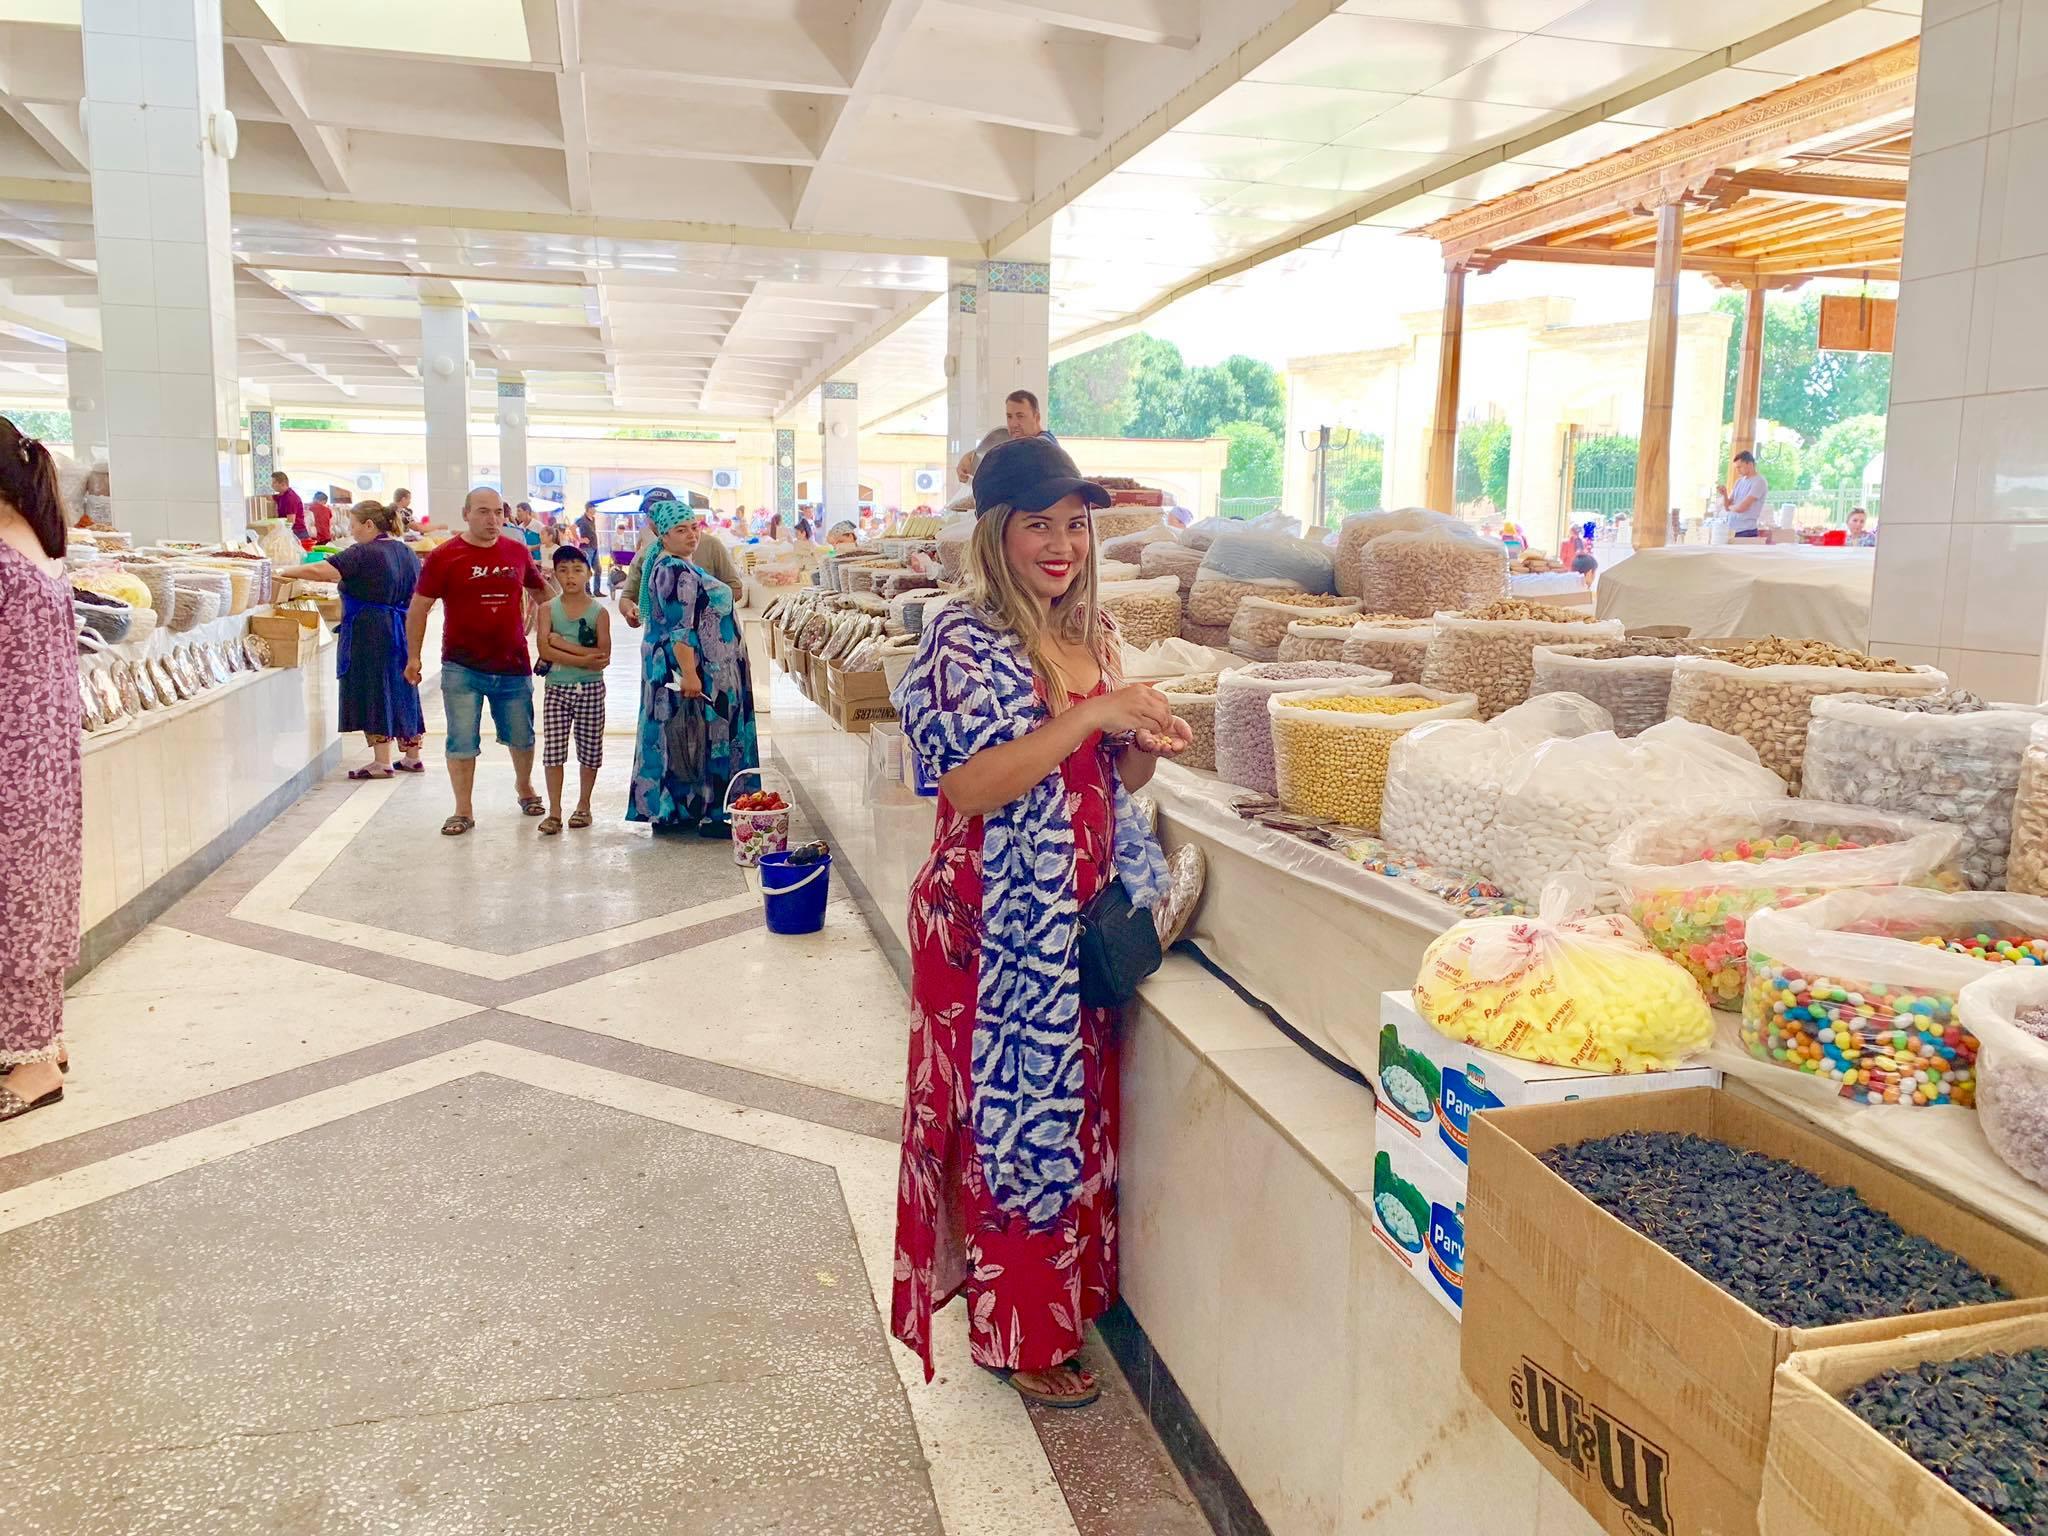 Kach Solo Travels in 2019 Siyab Bazaar and Registan on my first day in Samarkand15.jpg